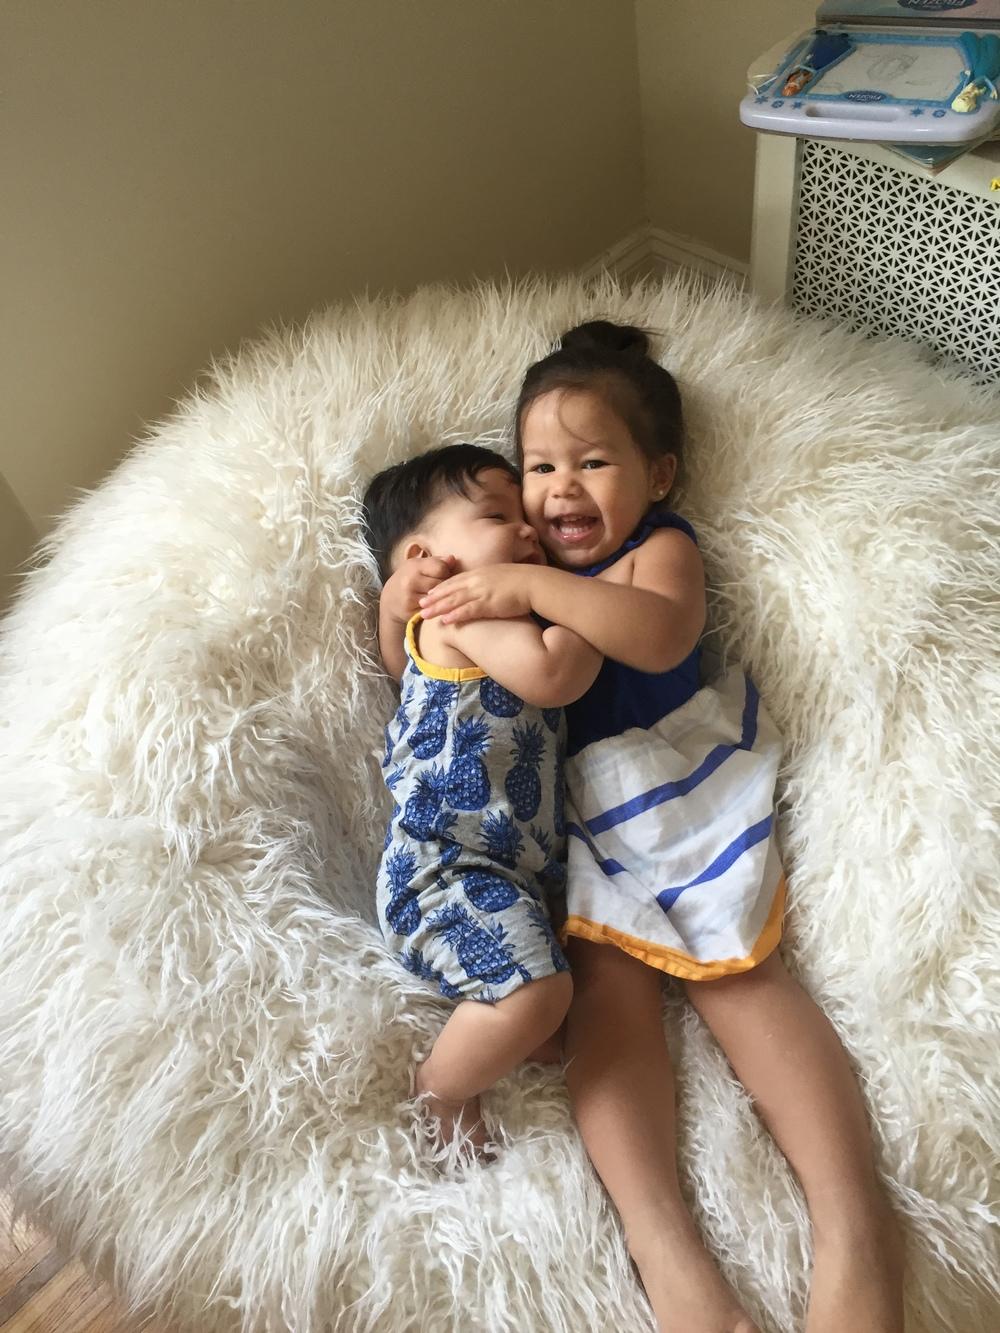 Sibling cuddles!